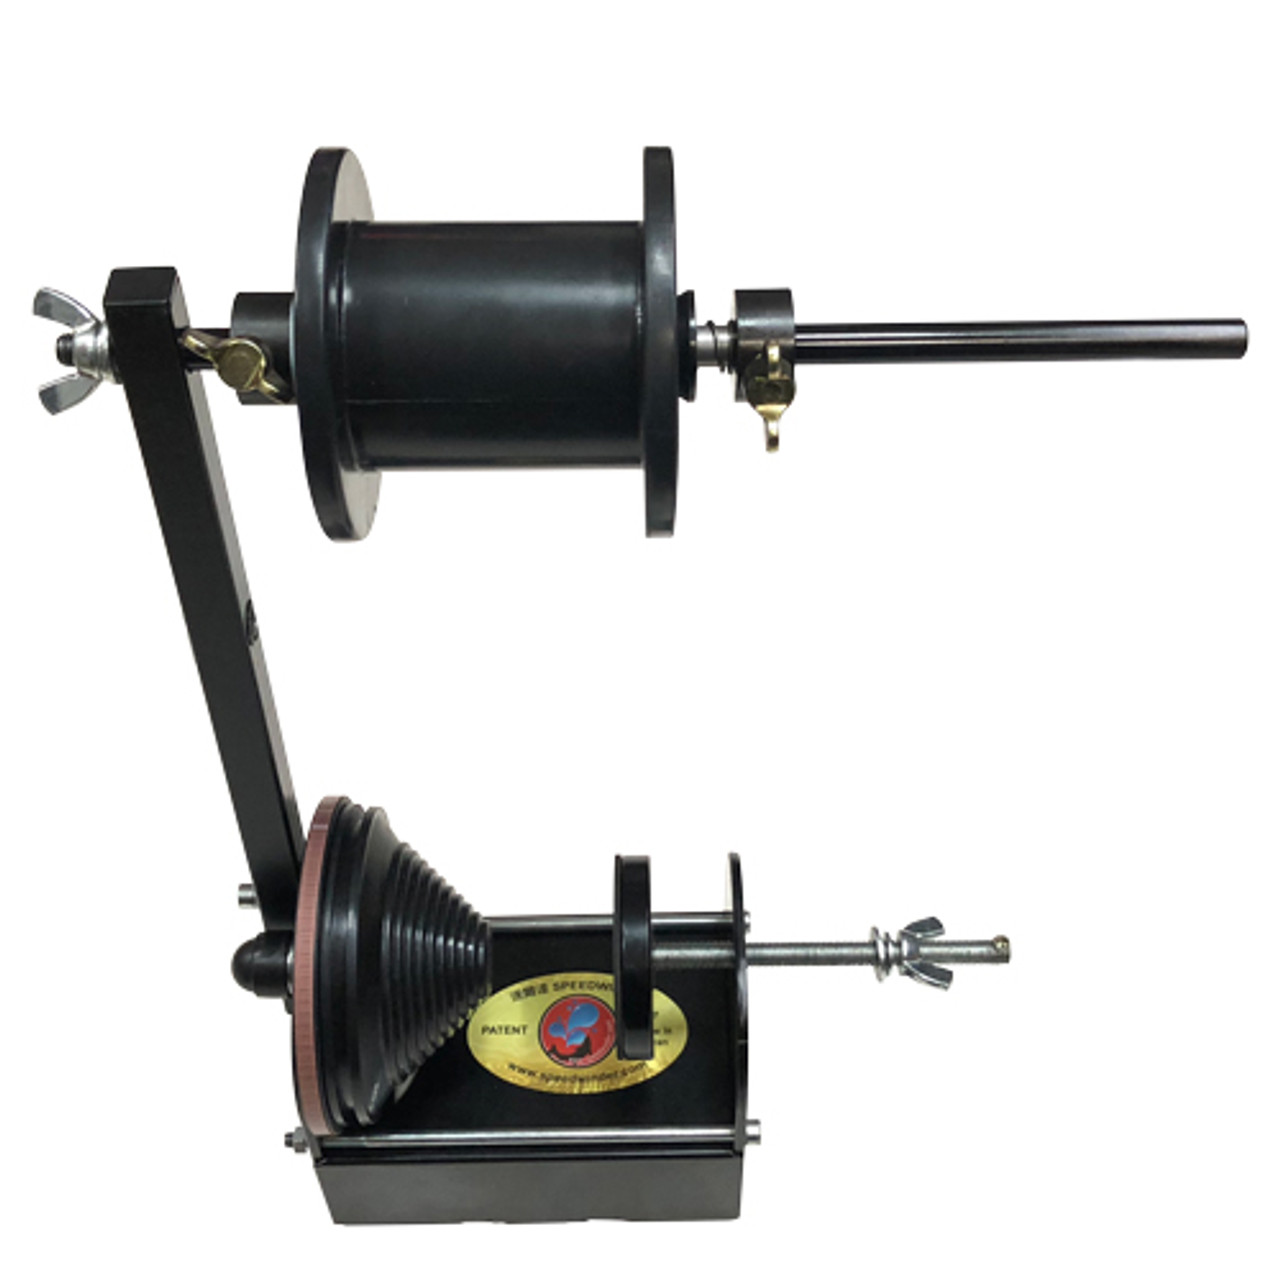 SP-60 Line Winding Machine